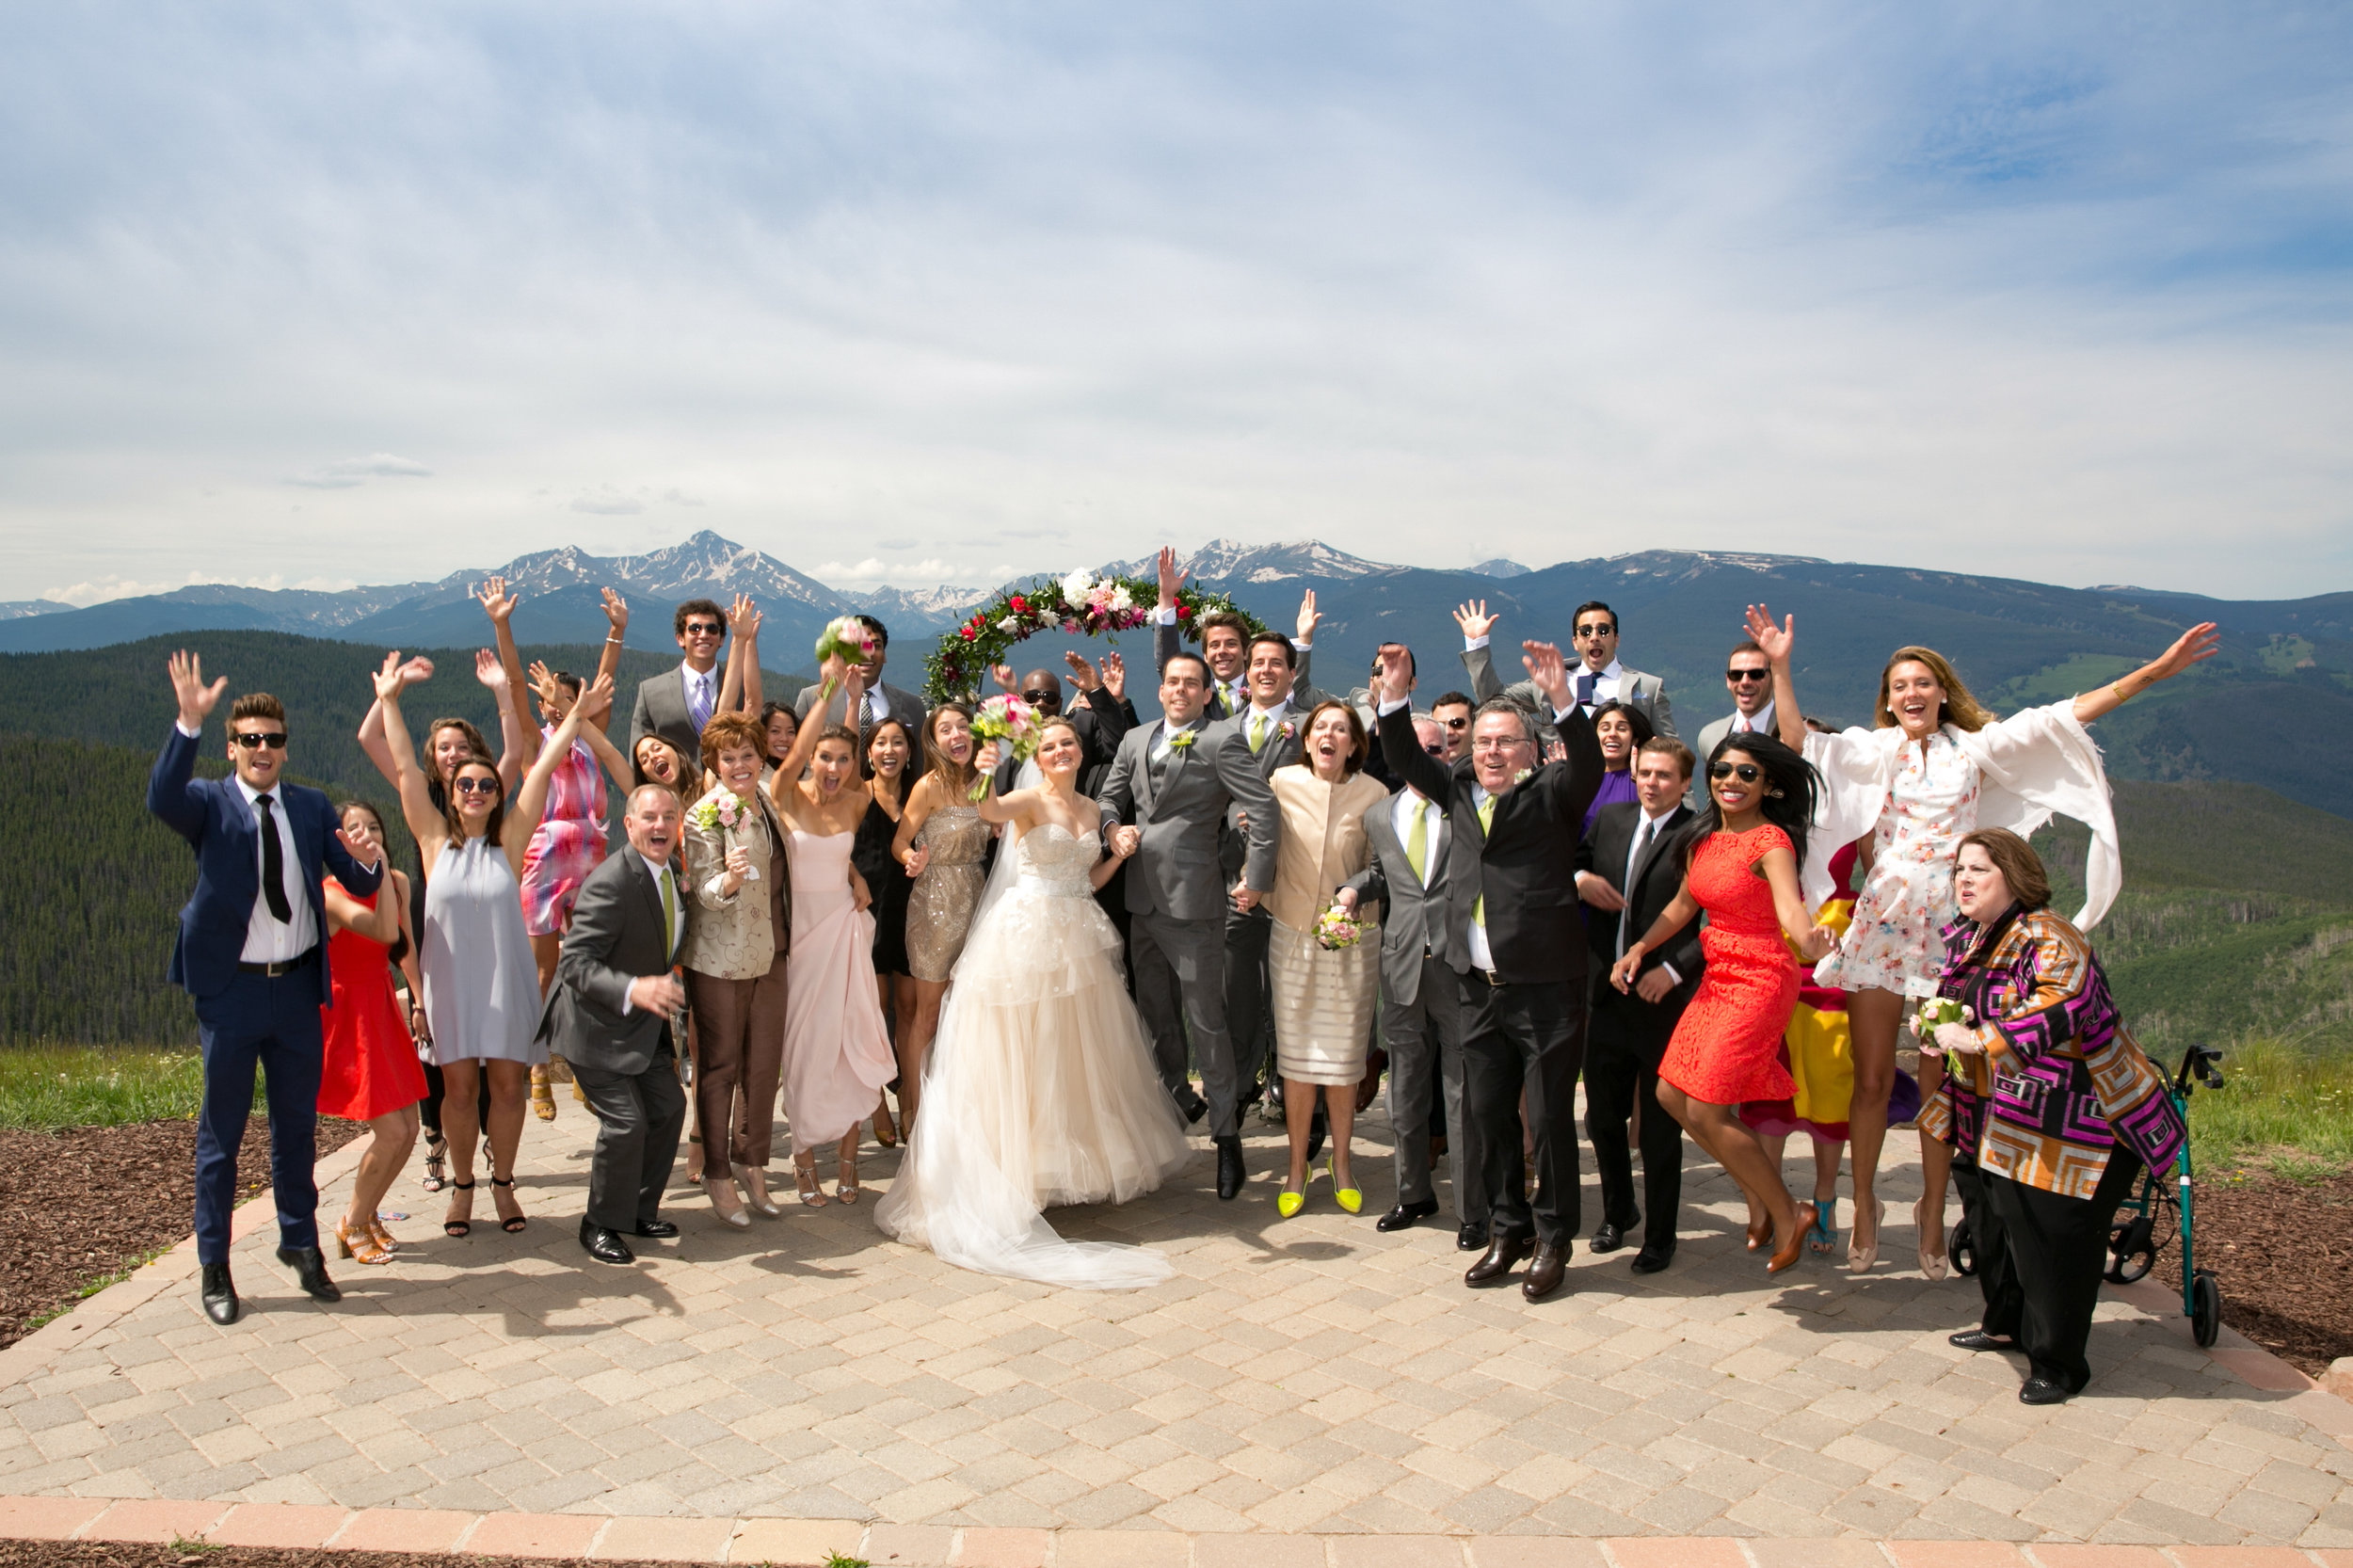 wedding-services-vail-axelphoto.jpg